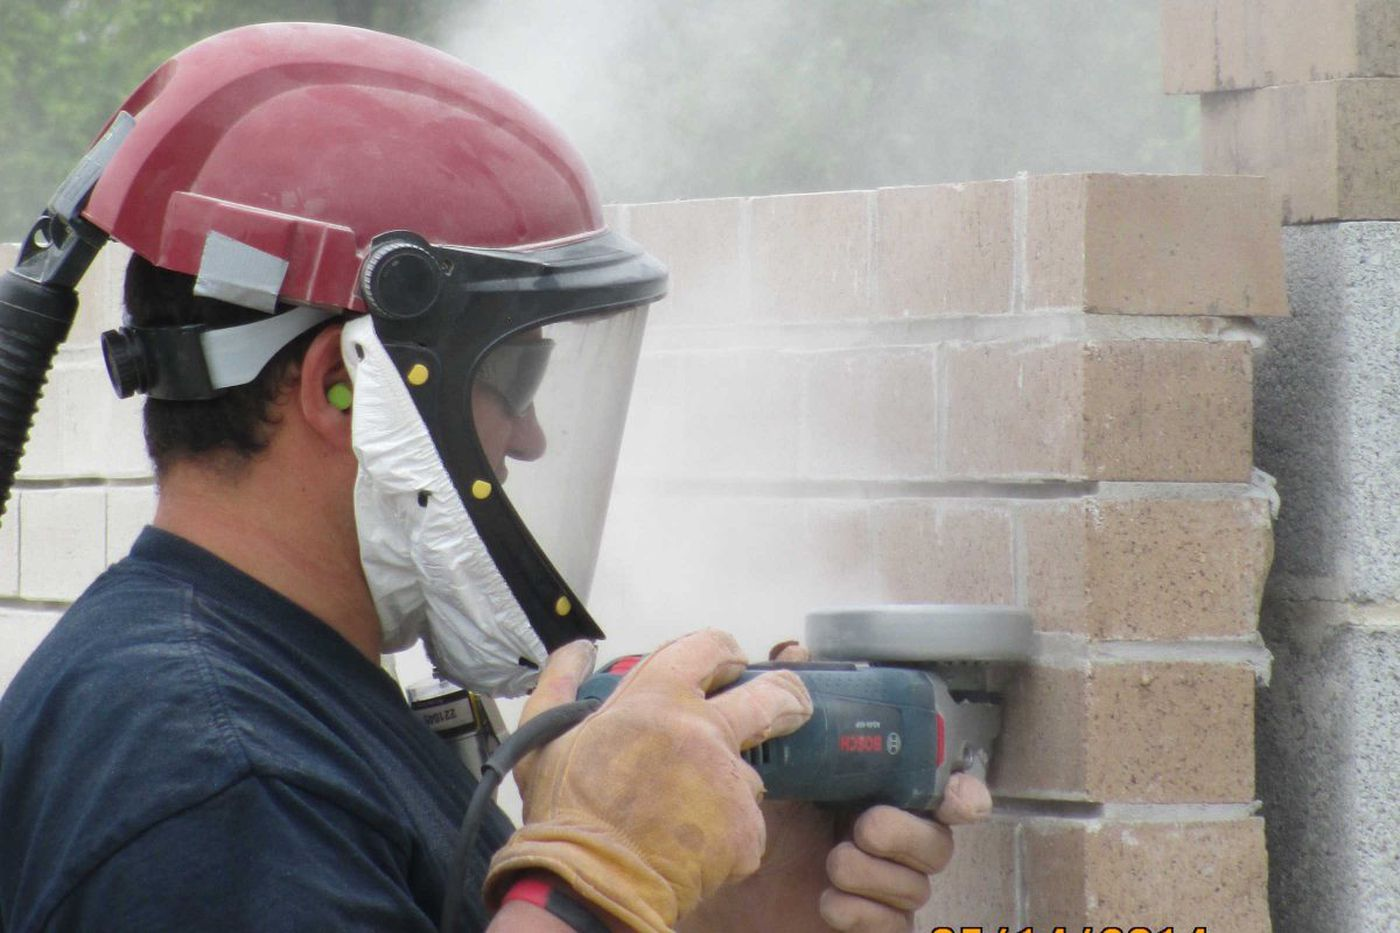 New silica dust regs confuse, concern contractors